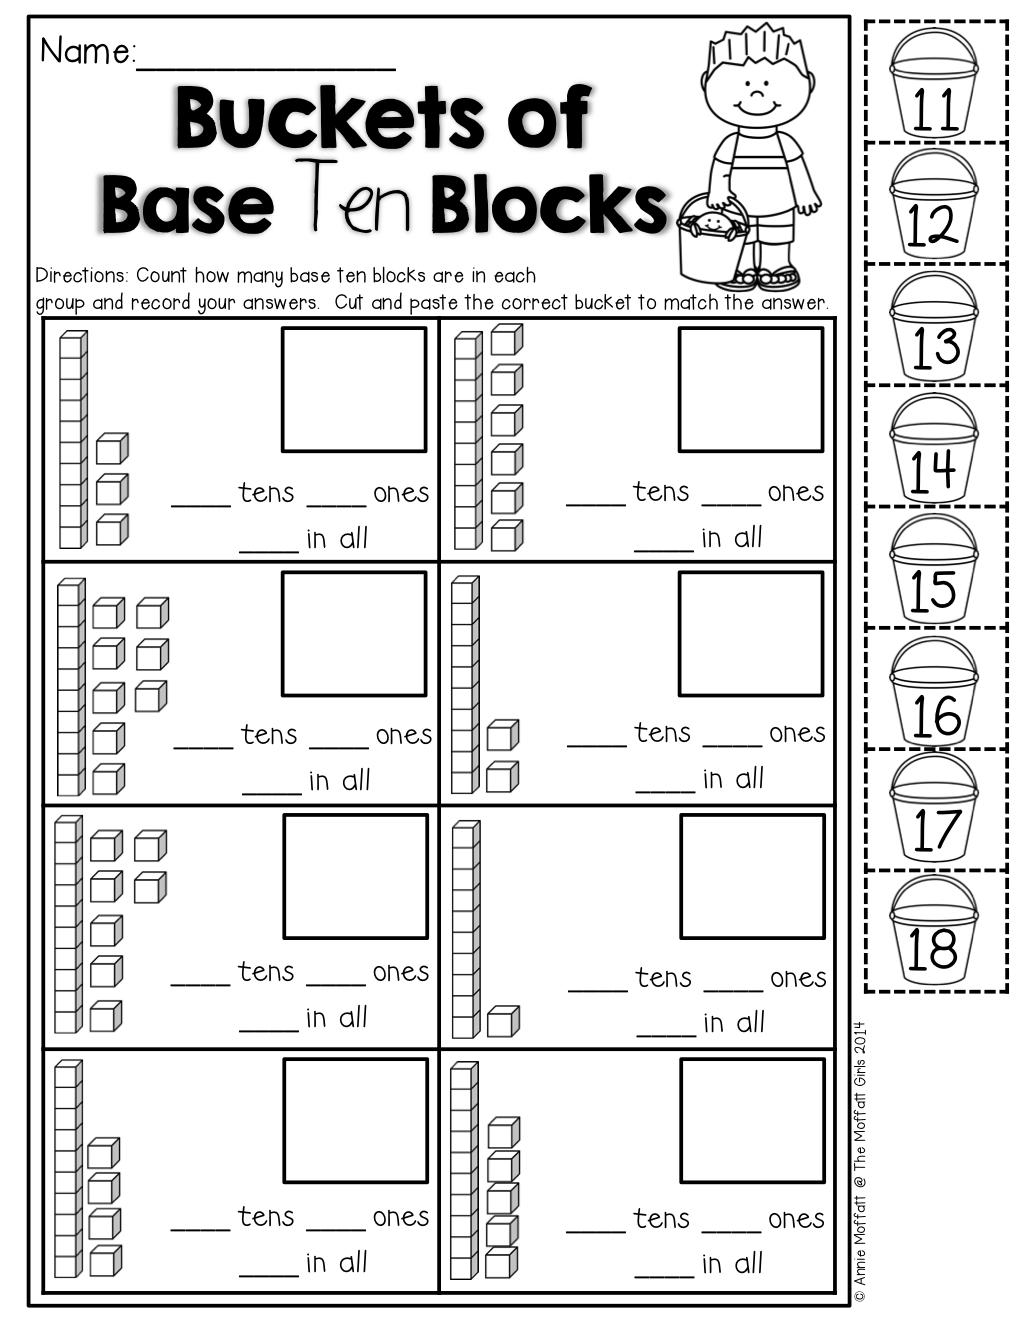 medium resolution of https://dubaikhalifas.com/first-grade-math-worksheets-base-10-blocks-k5-learning/